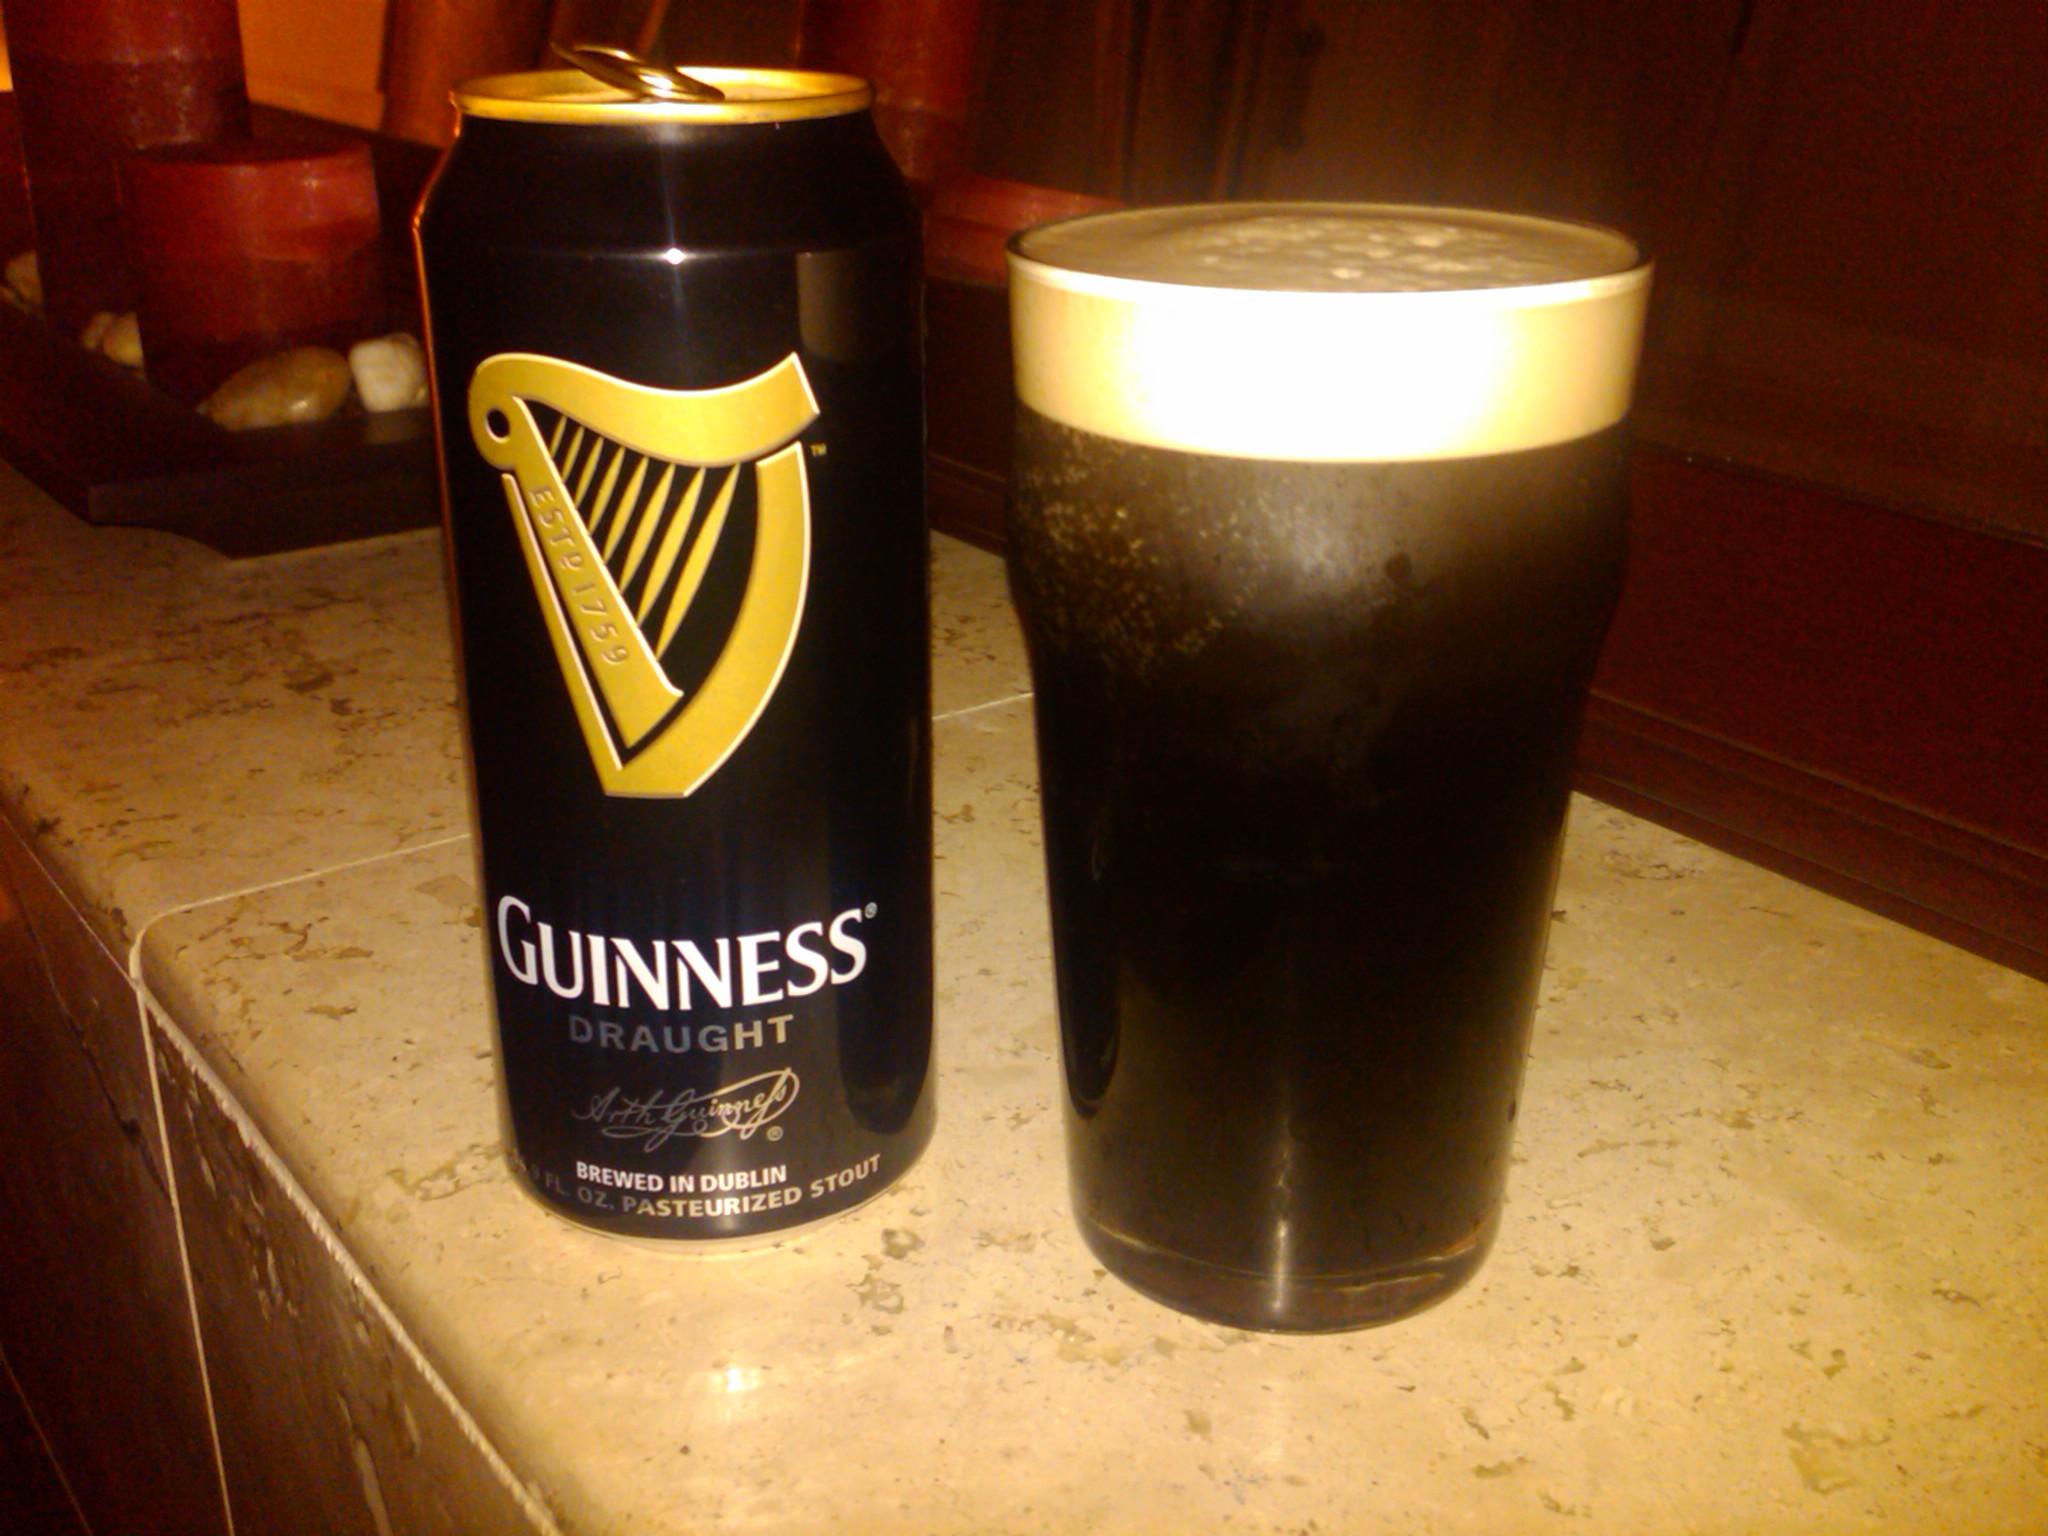 The beer ninjas a beer flavored salvo of carnage for Guinness beer in ireland